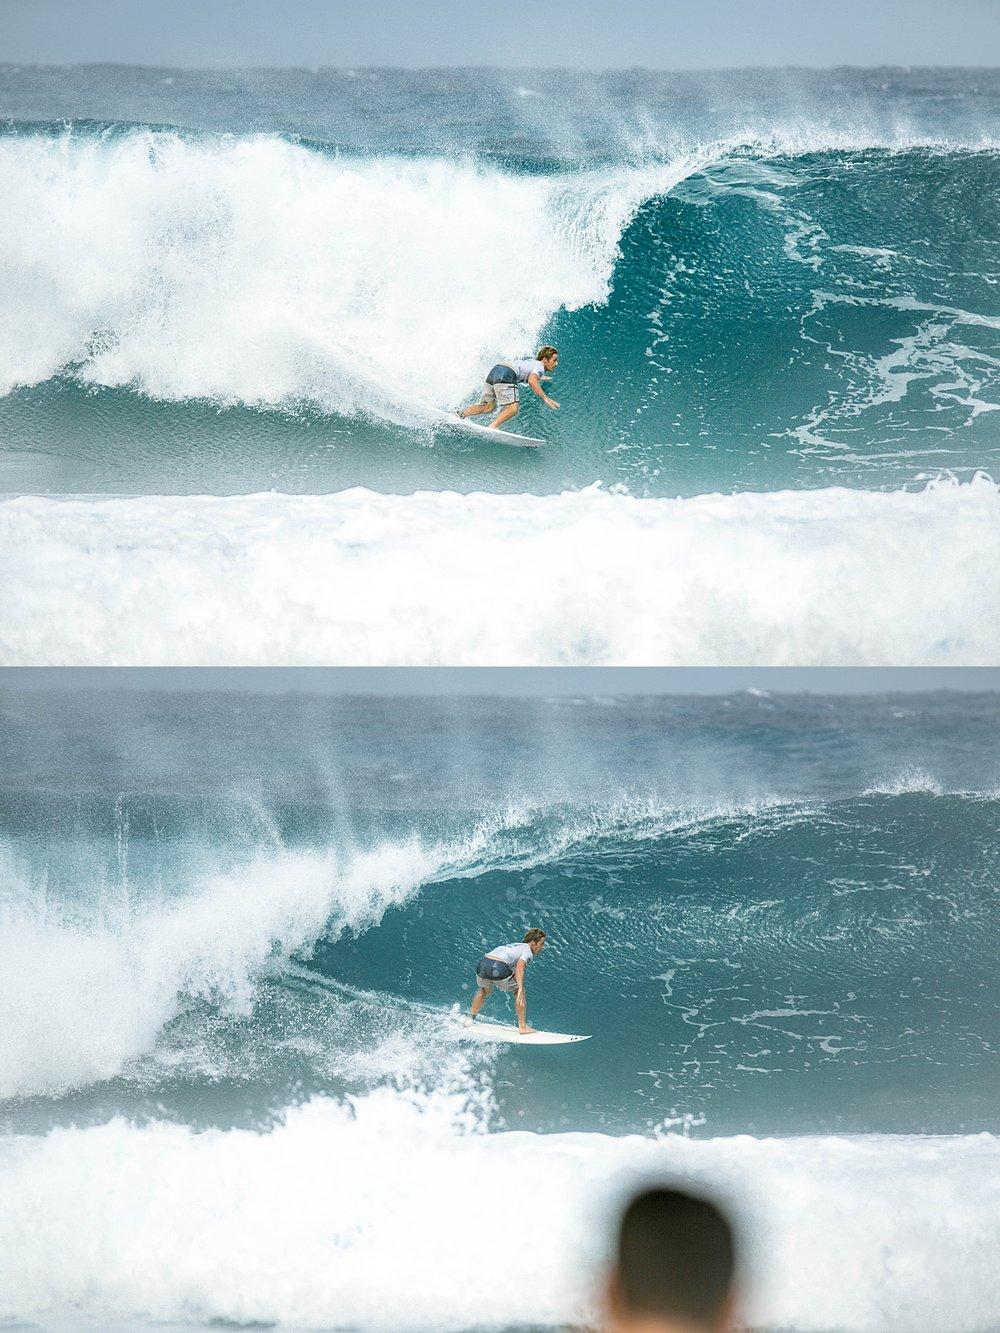 Travel Surf and Travel Lifestyle Photographer Kelee Bovelle @keleeb - Billabong Pipe Masters 2018 North Shore Oahu Hawaii_0008.jpg